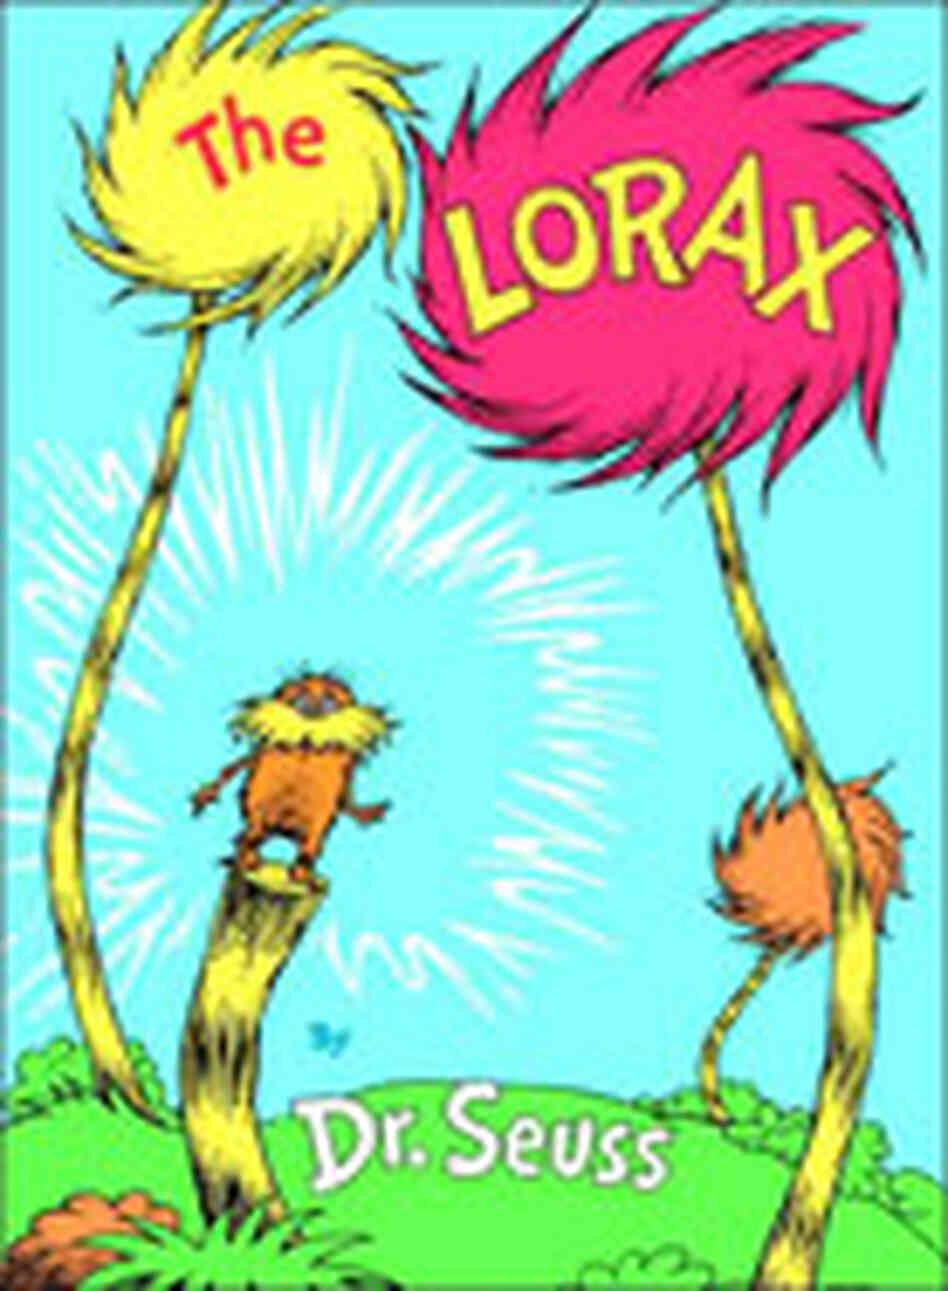 Paper suggests Kenyan monkey inspired Dr. Seuss' Lorax